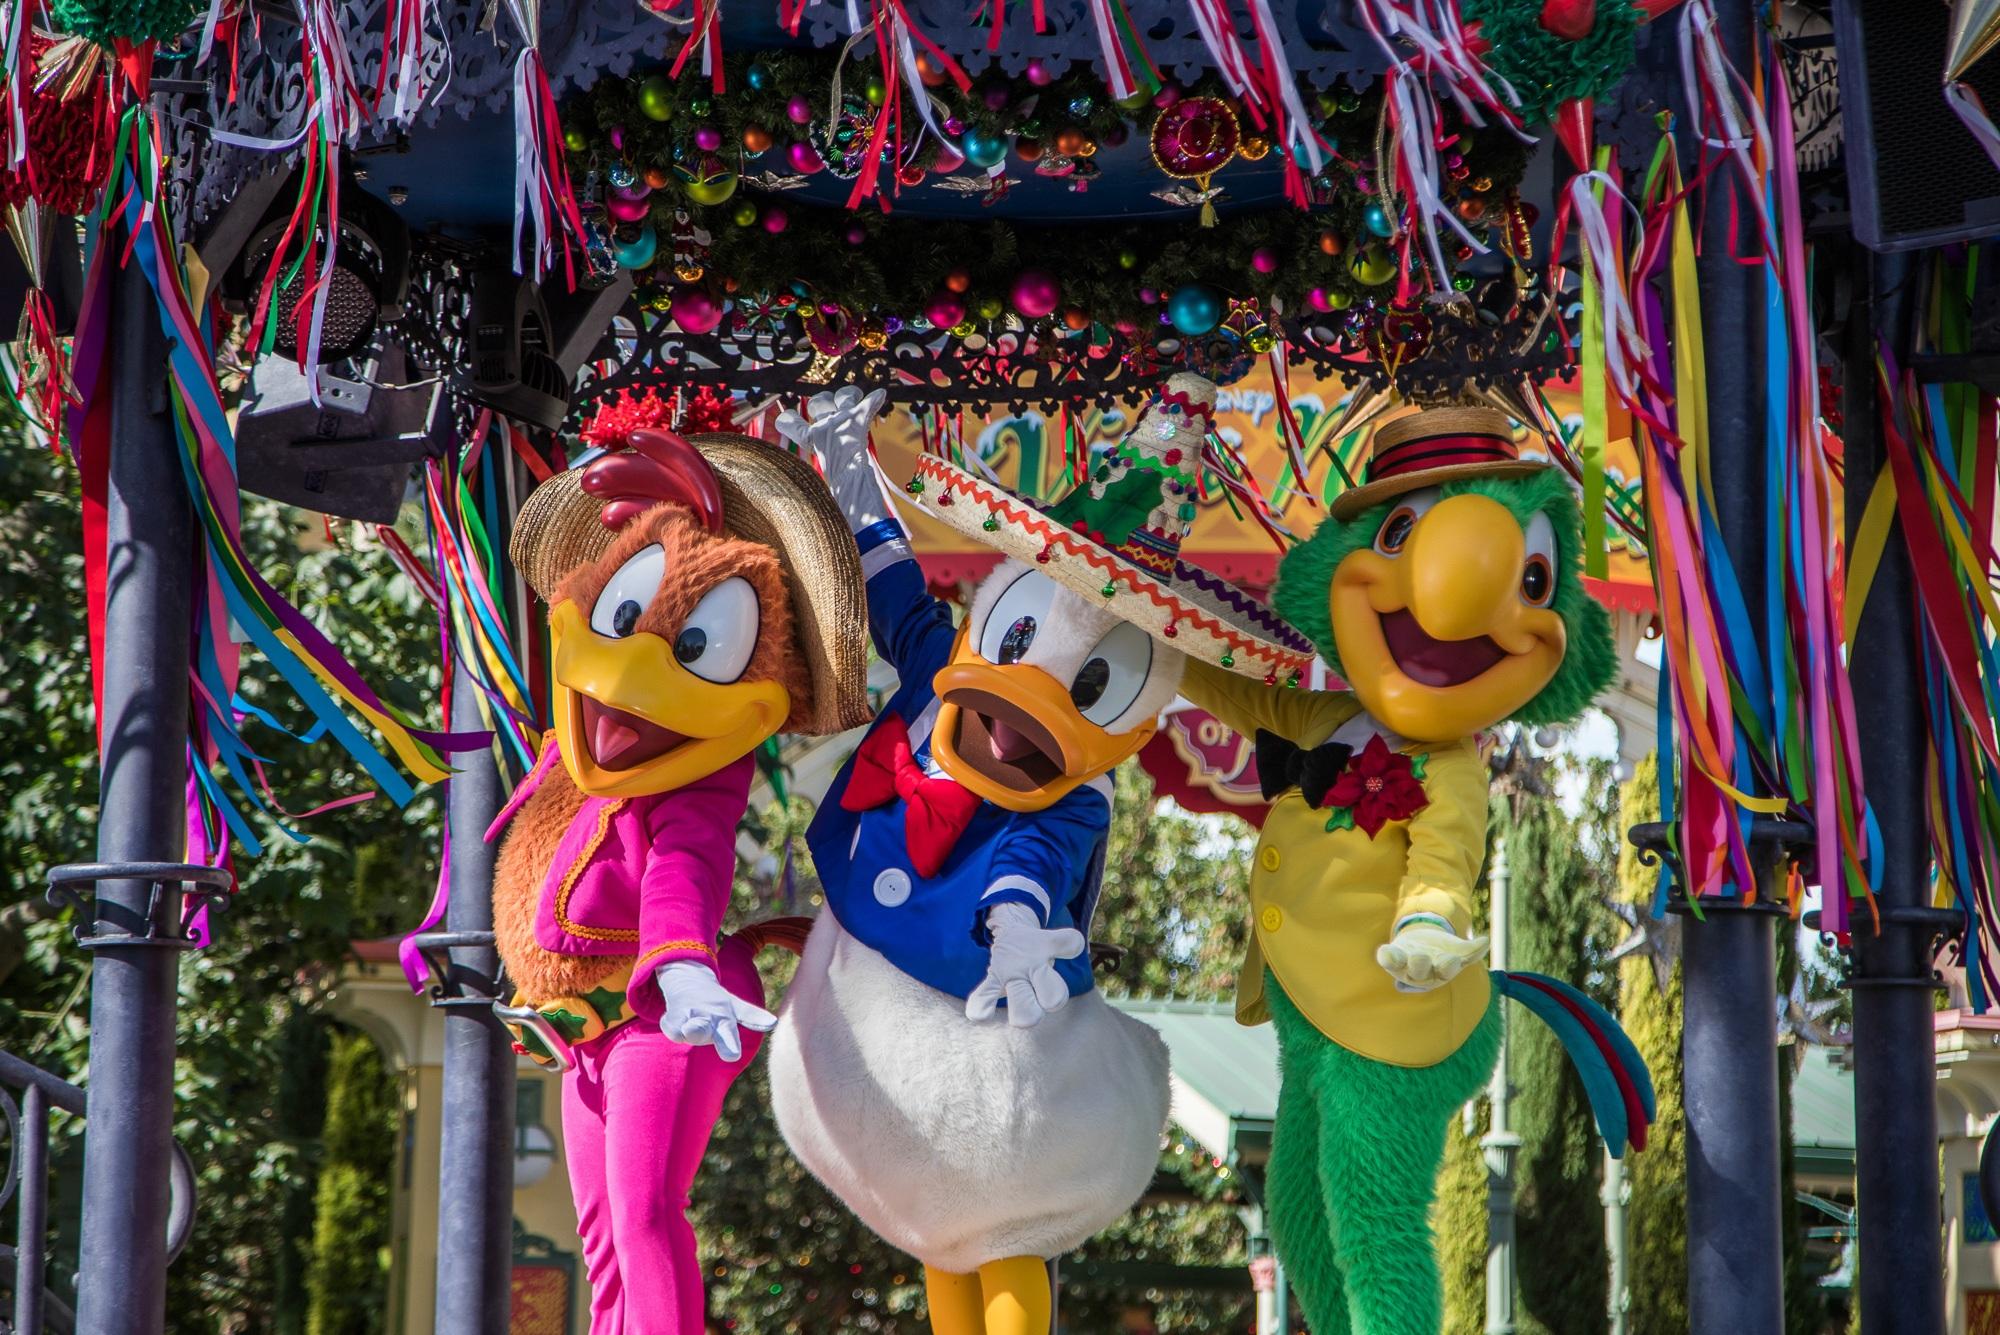 The Three Caballeros at Disney ¡Viva Navidad! at Disney California Adventure